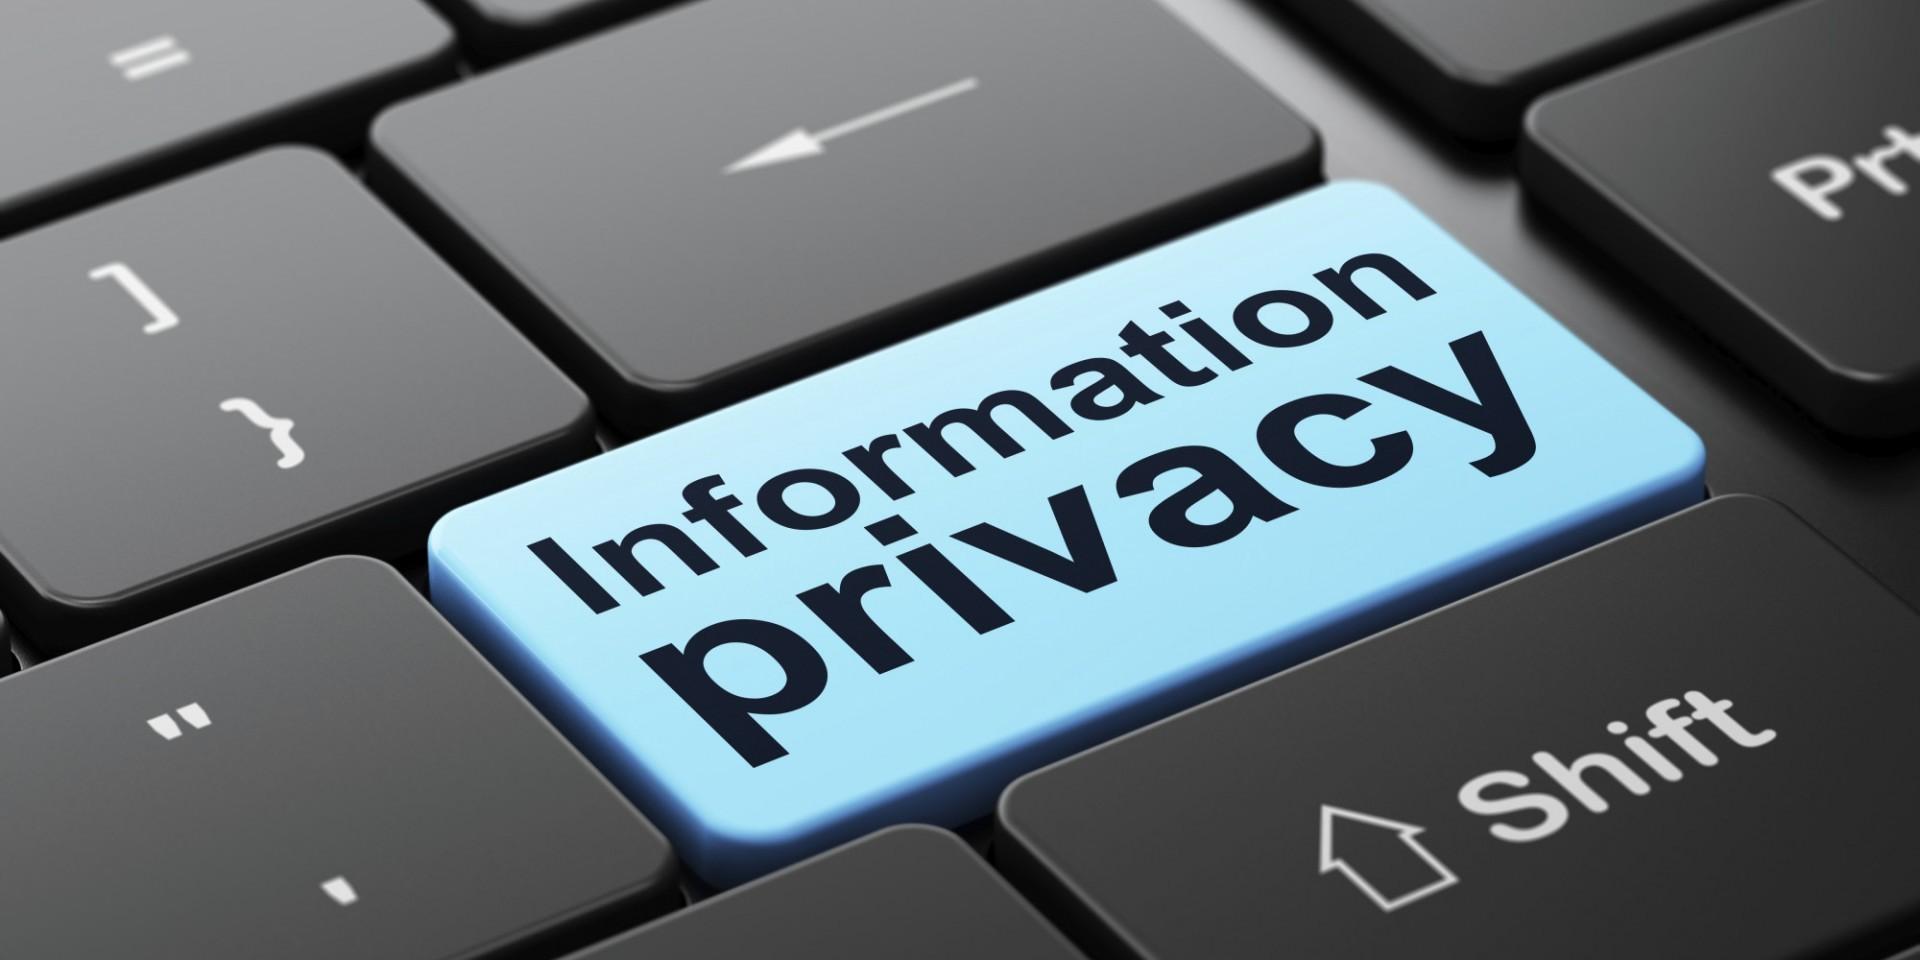 o_internet_privacy_facebook.jpg